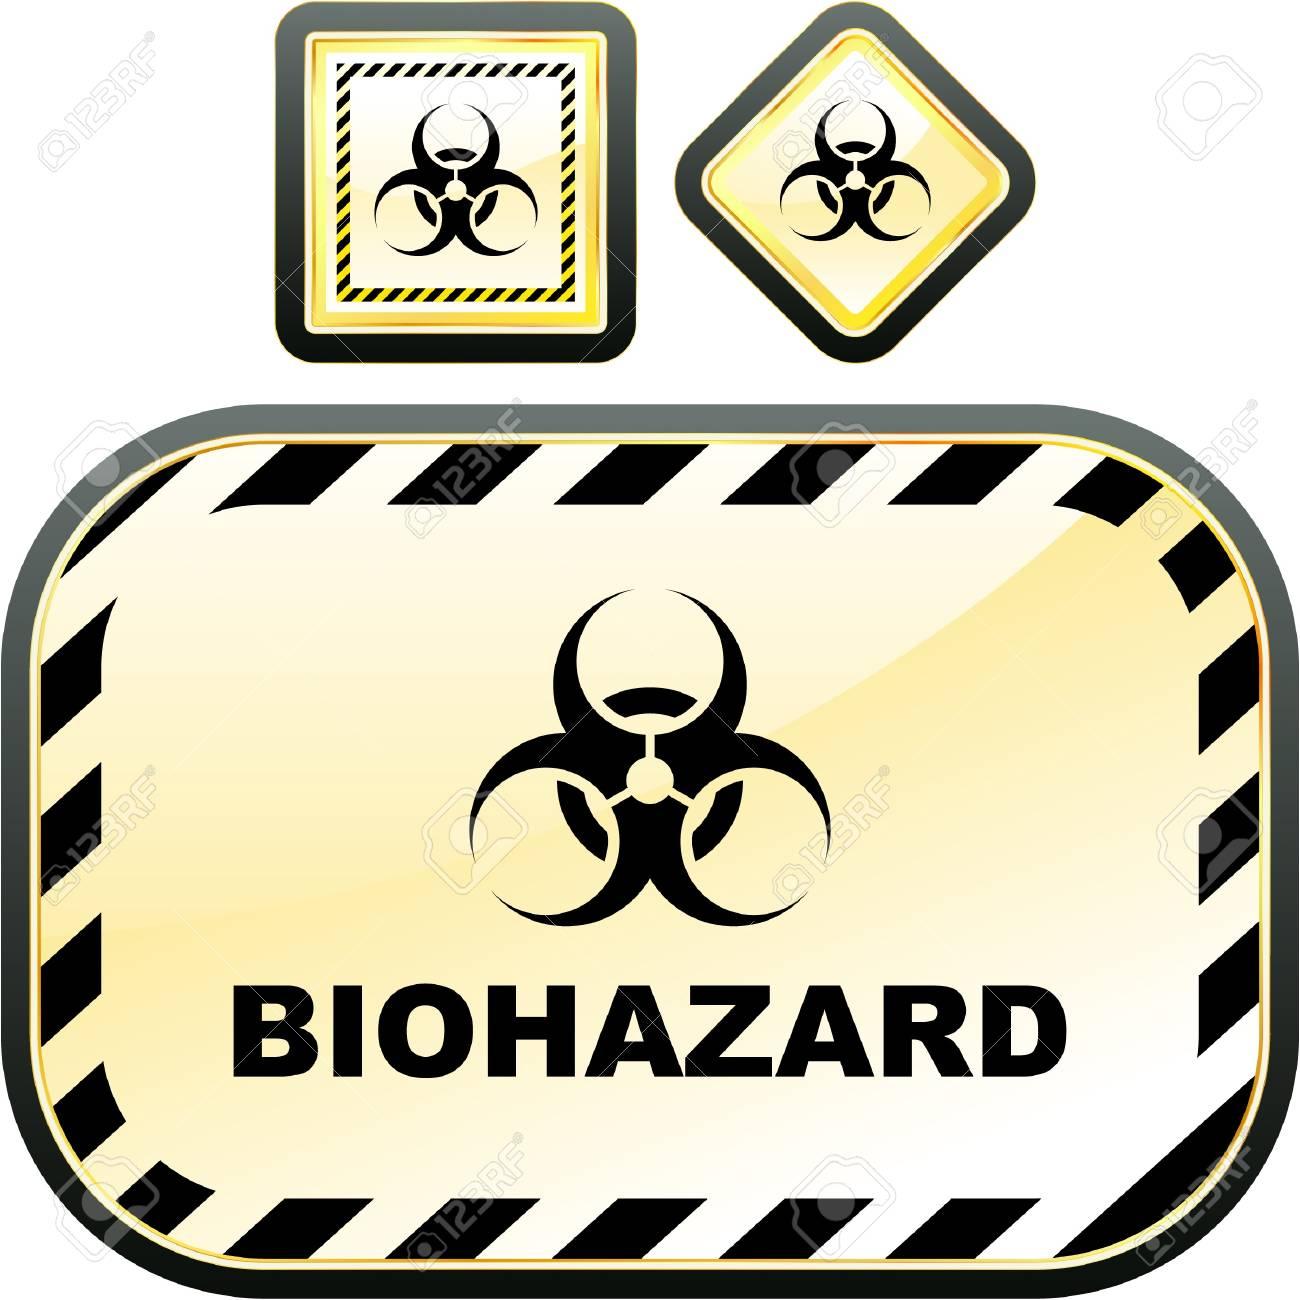 Biohazard sign. Vector illustration. Stock Vector - 9039135